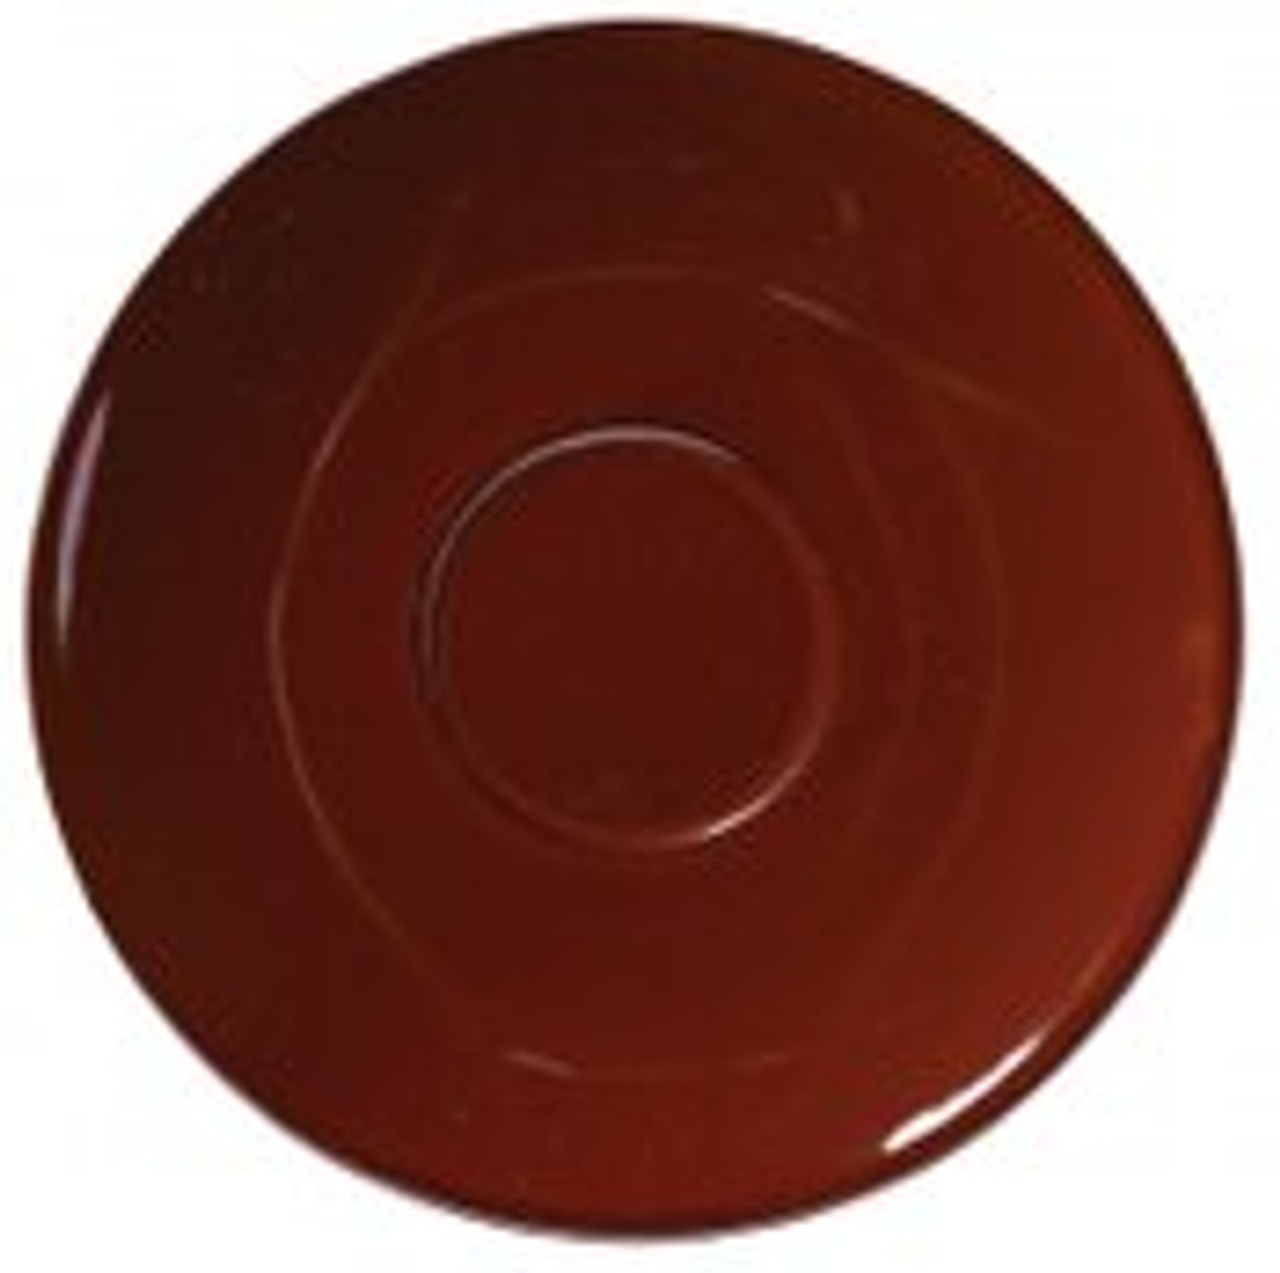 "Revware Saucer, 6.5"", Brown"